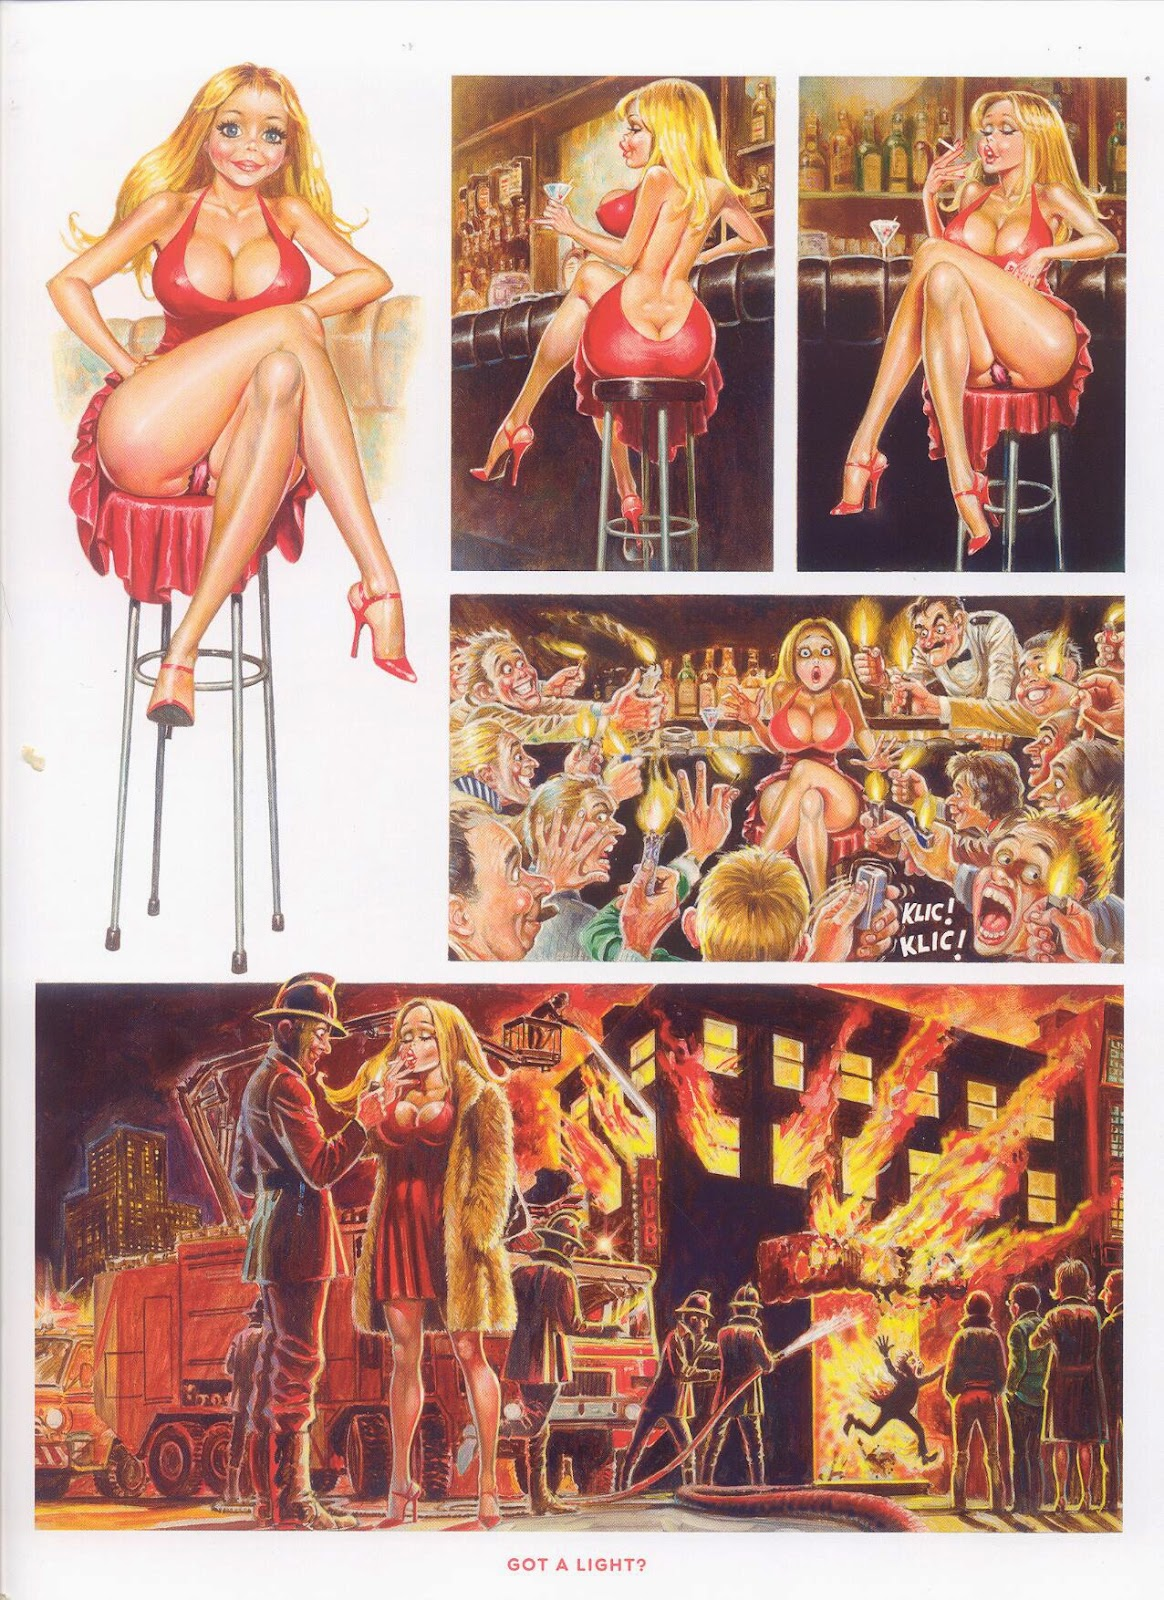 Breast of Dolly, SQP, Cartoon Sex, Got a light?